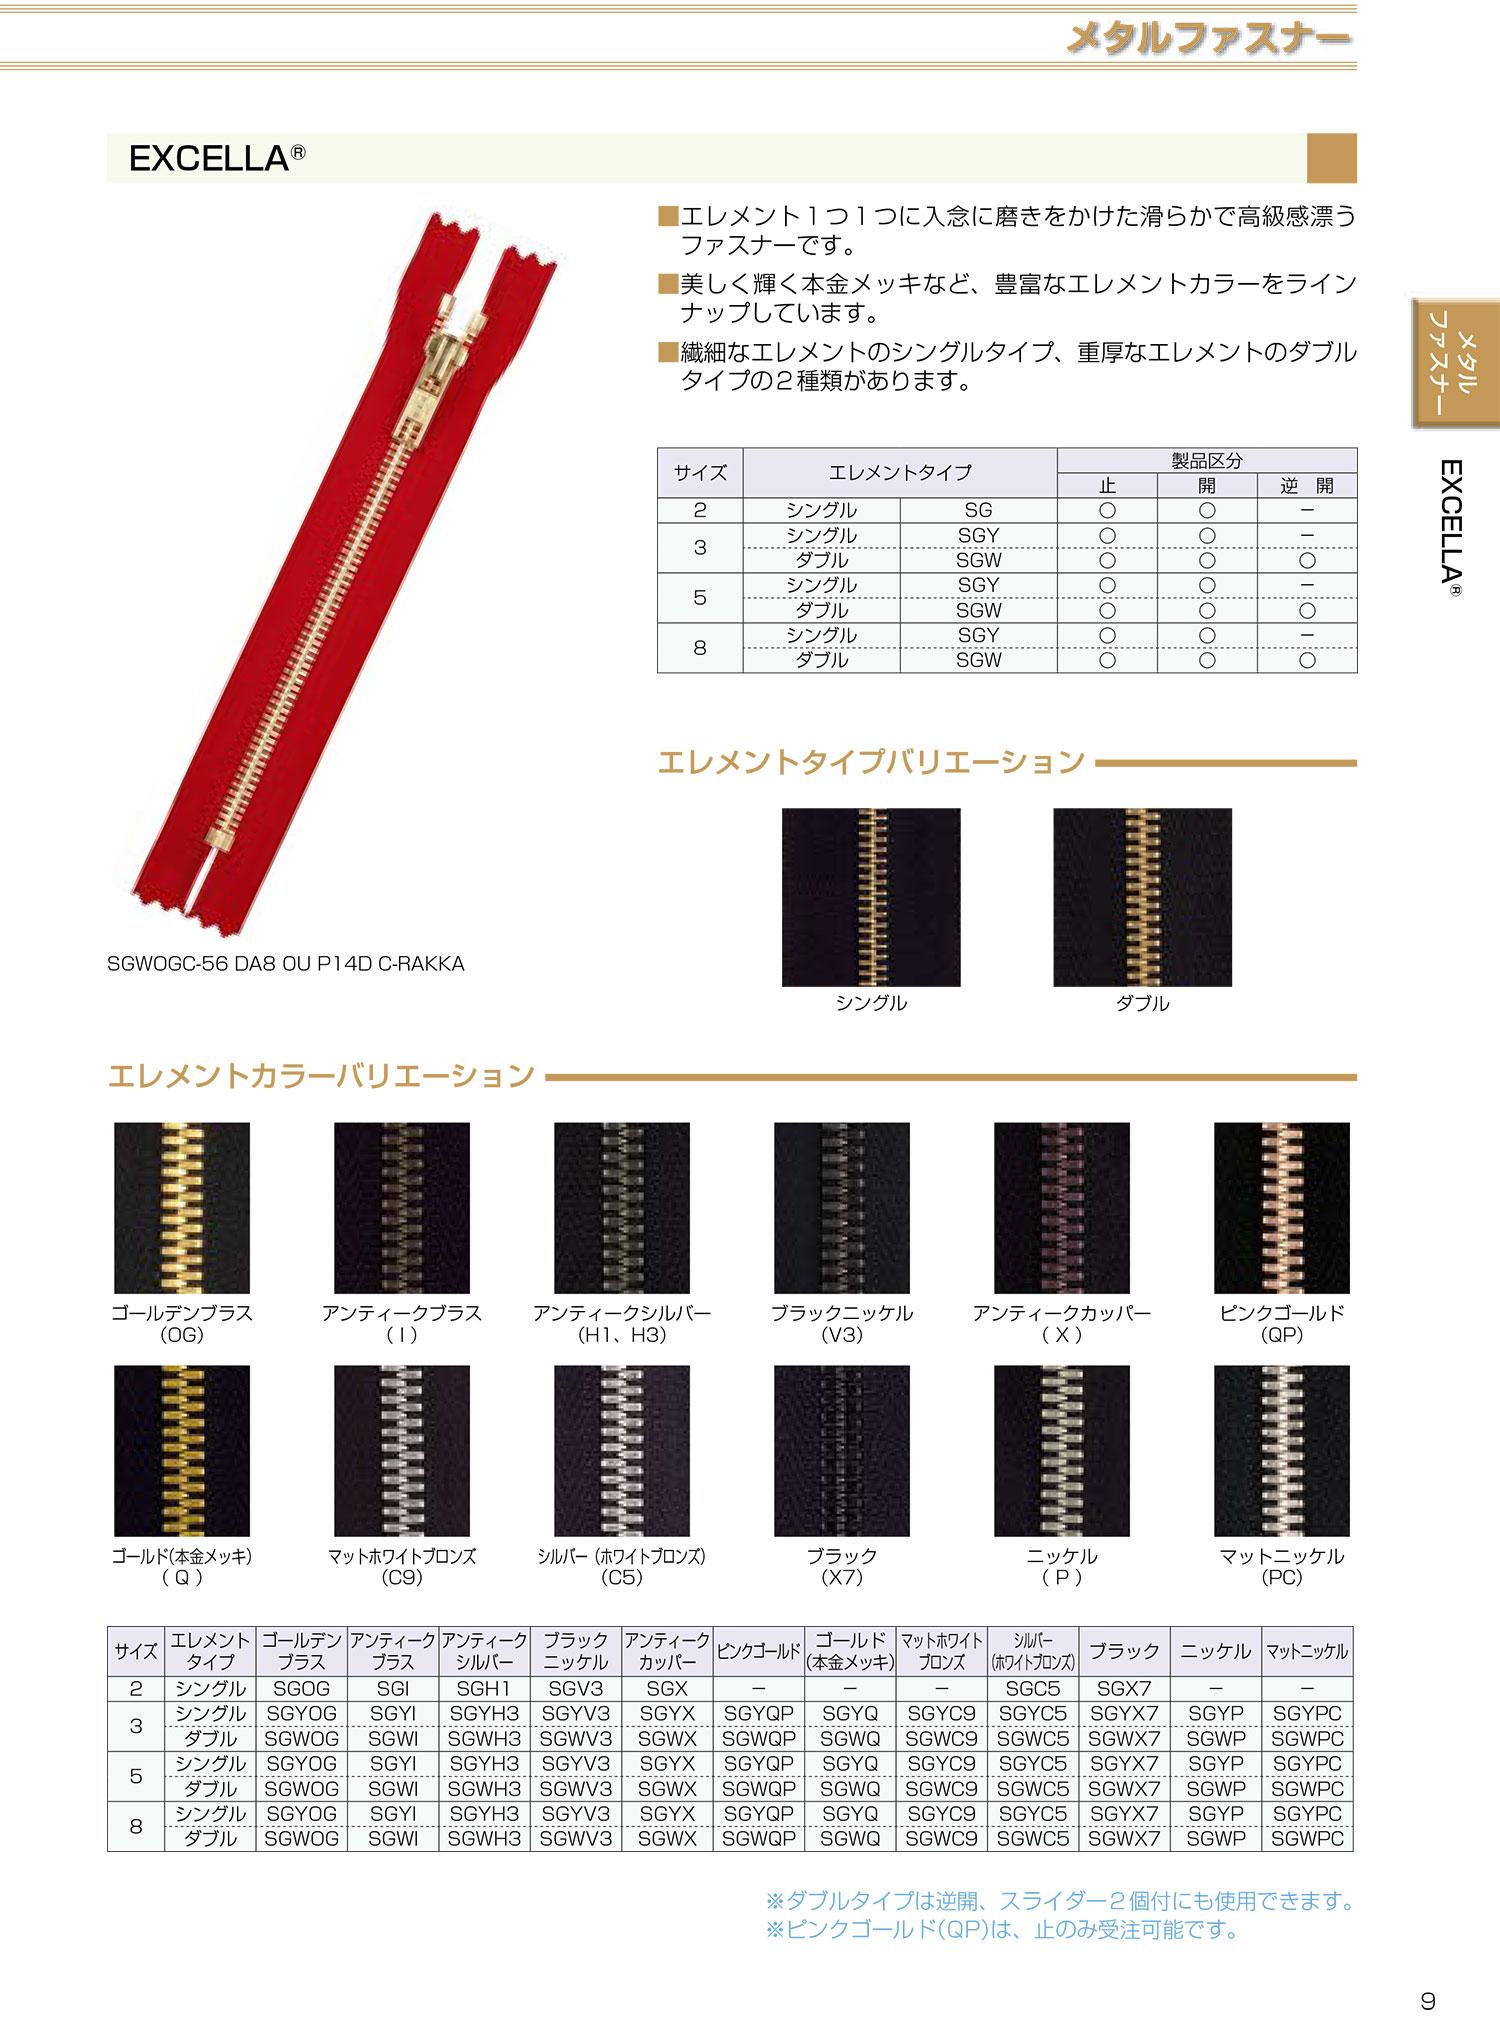 5SGWV3MR エクセラ 5サイズ ブラックニッケル 逆開 ダブル[ファスナー] YKK/オークラ商事 - ApparelX アパレル資材卸通販